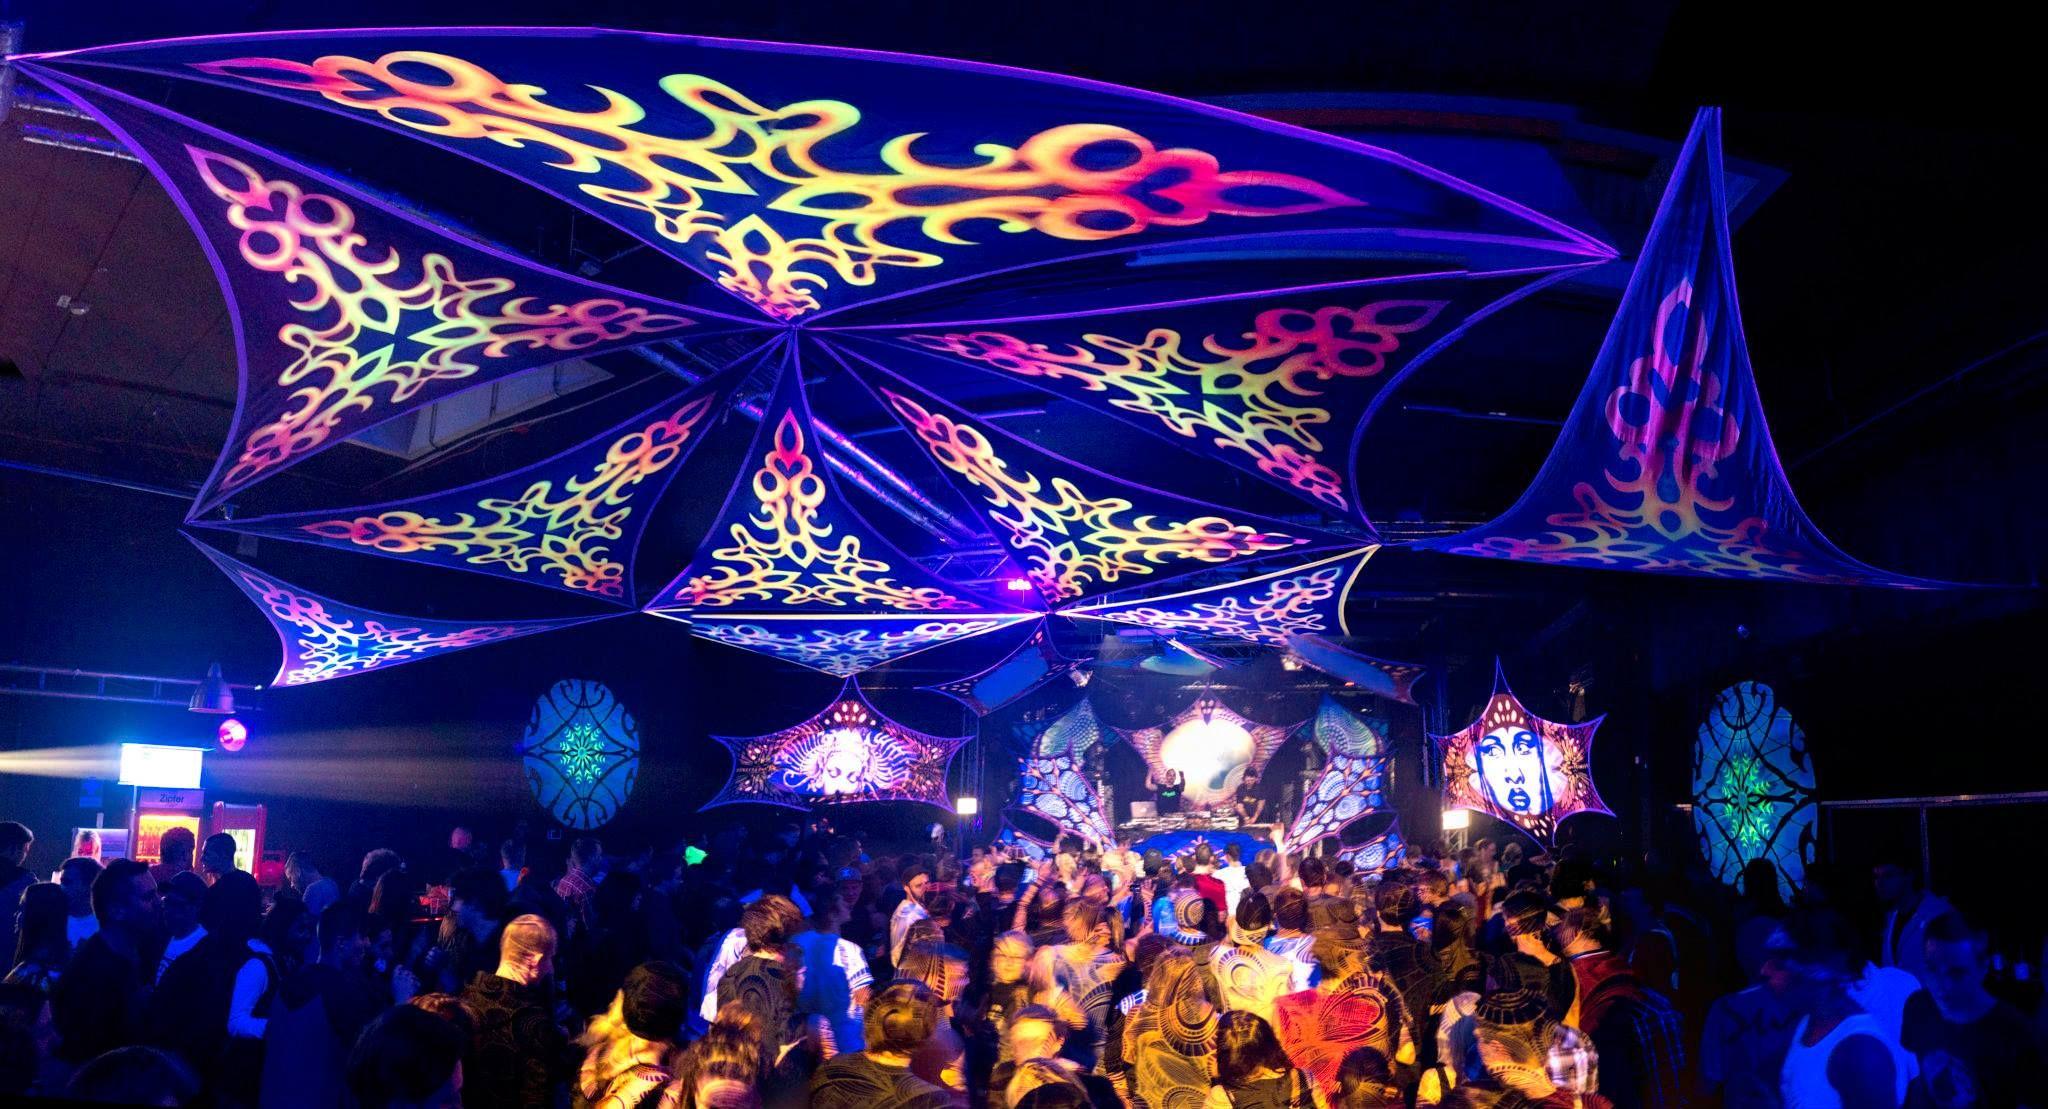 Uv Decoration Blacklight Decor Lycra Decoration Event Decor Decor Festival